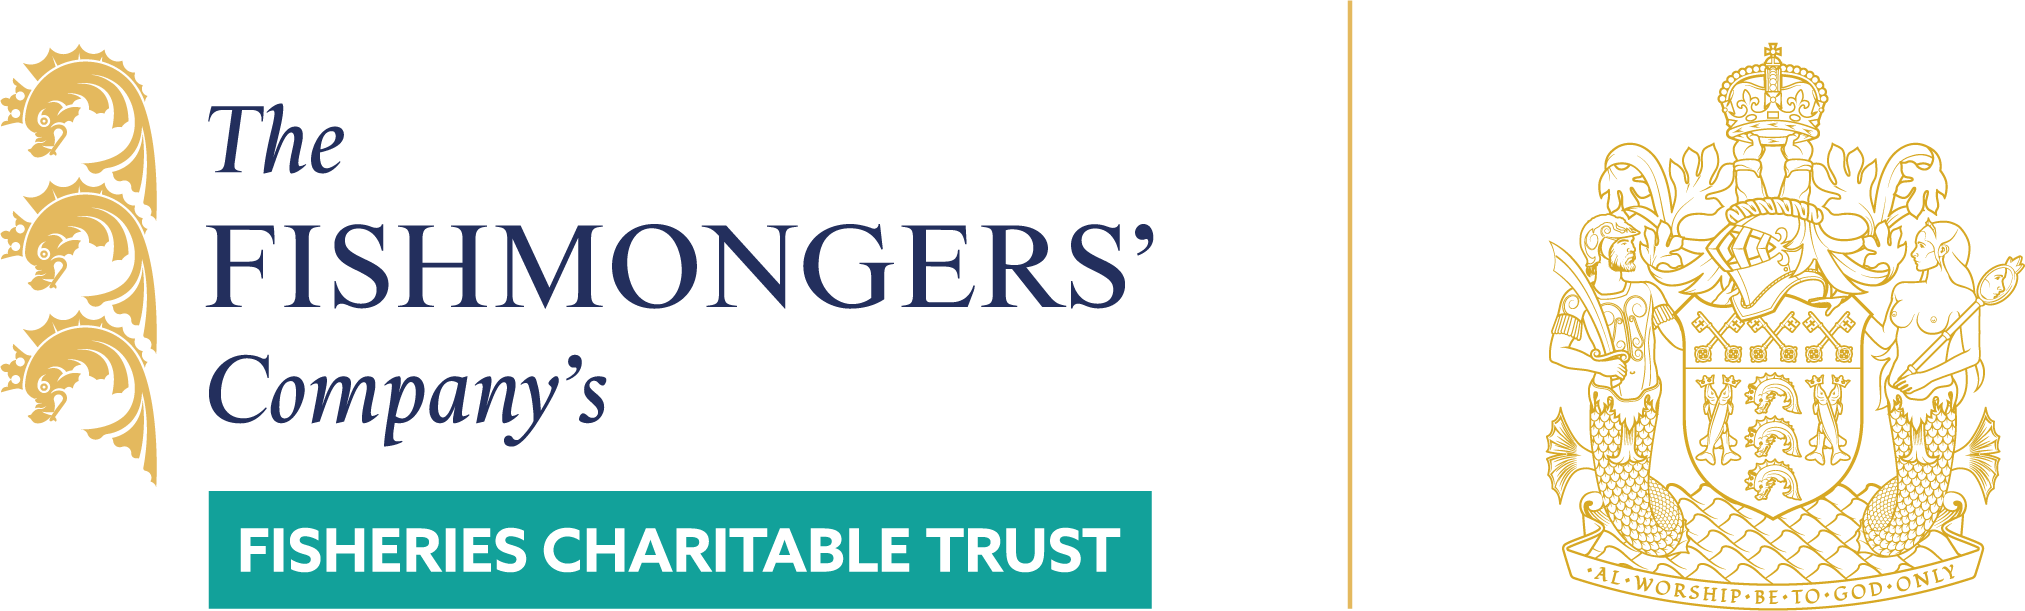 The Fishmonger's Company's Fisheries Charitable Trust